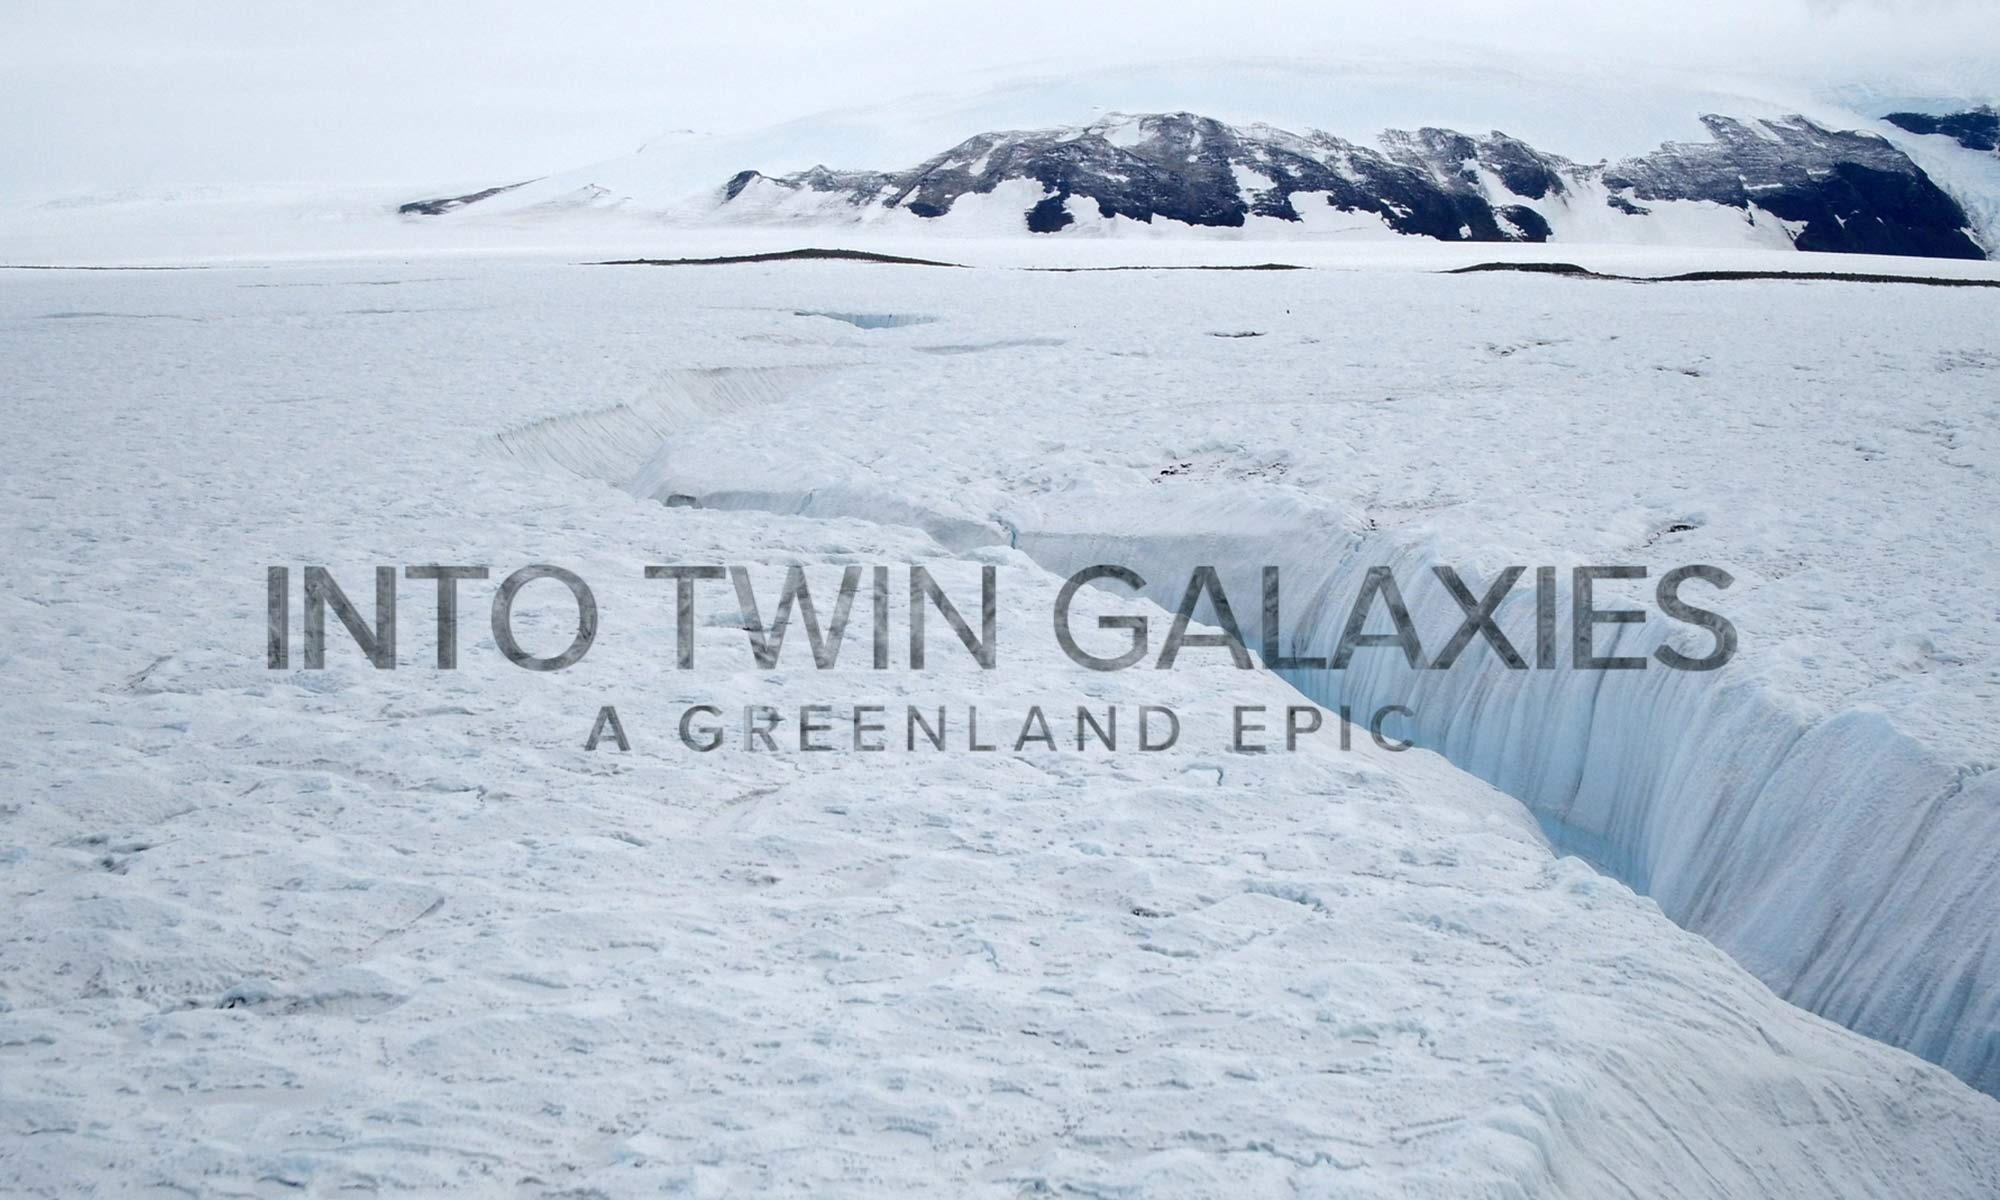 Into Twin galaxies